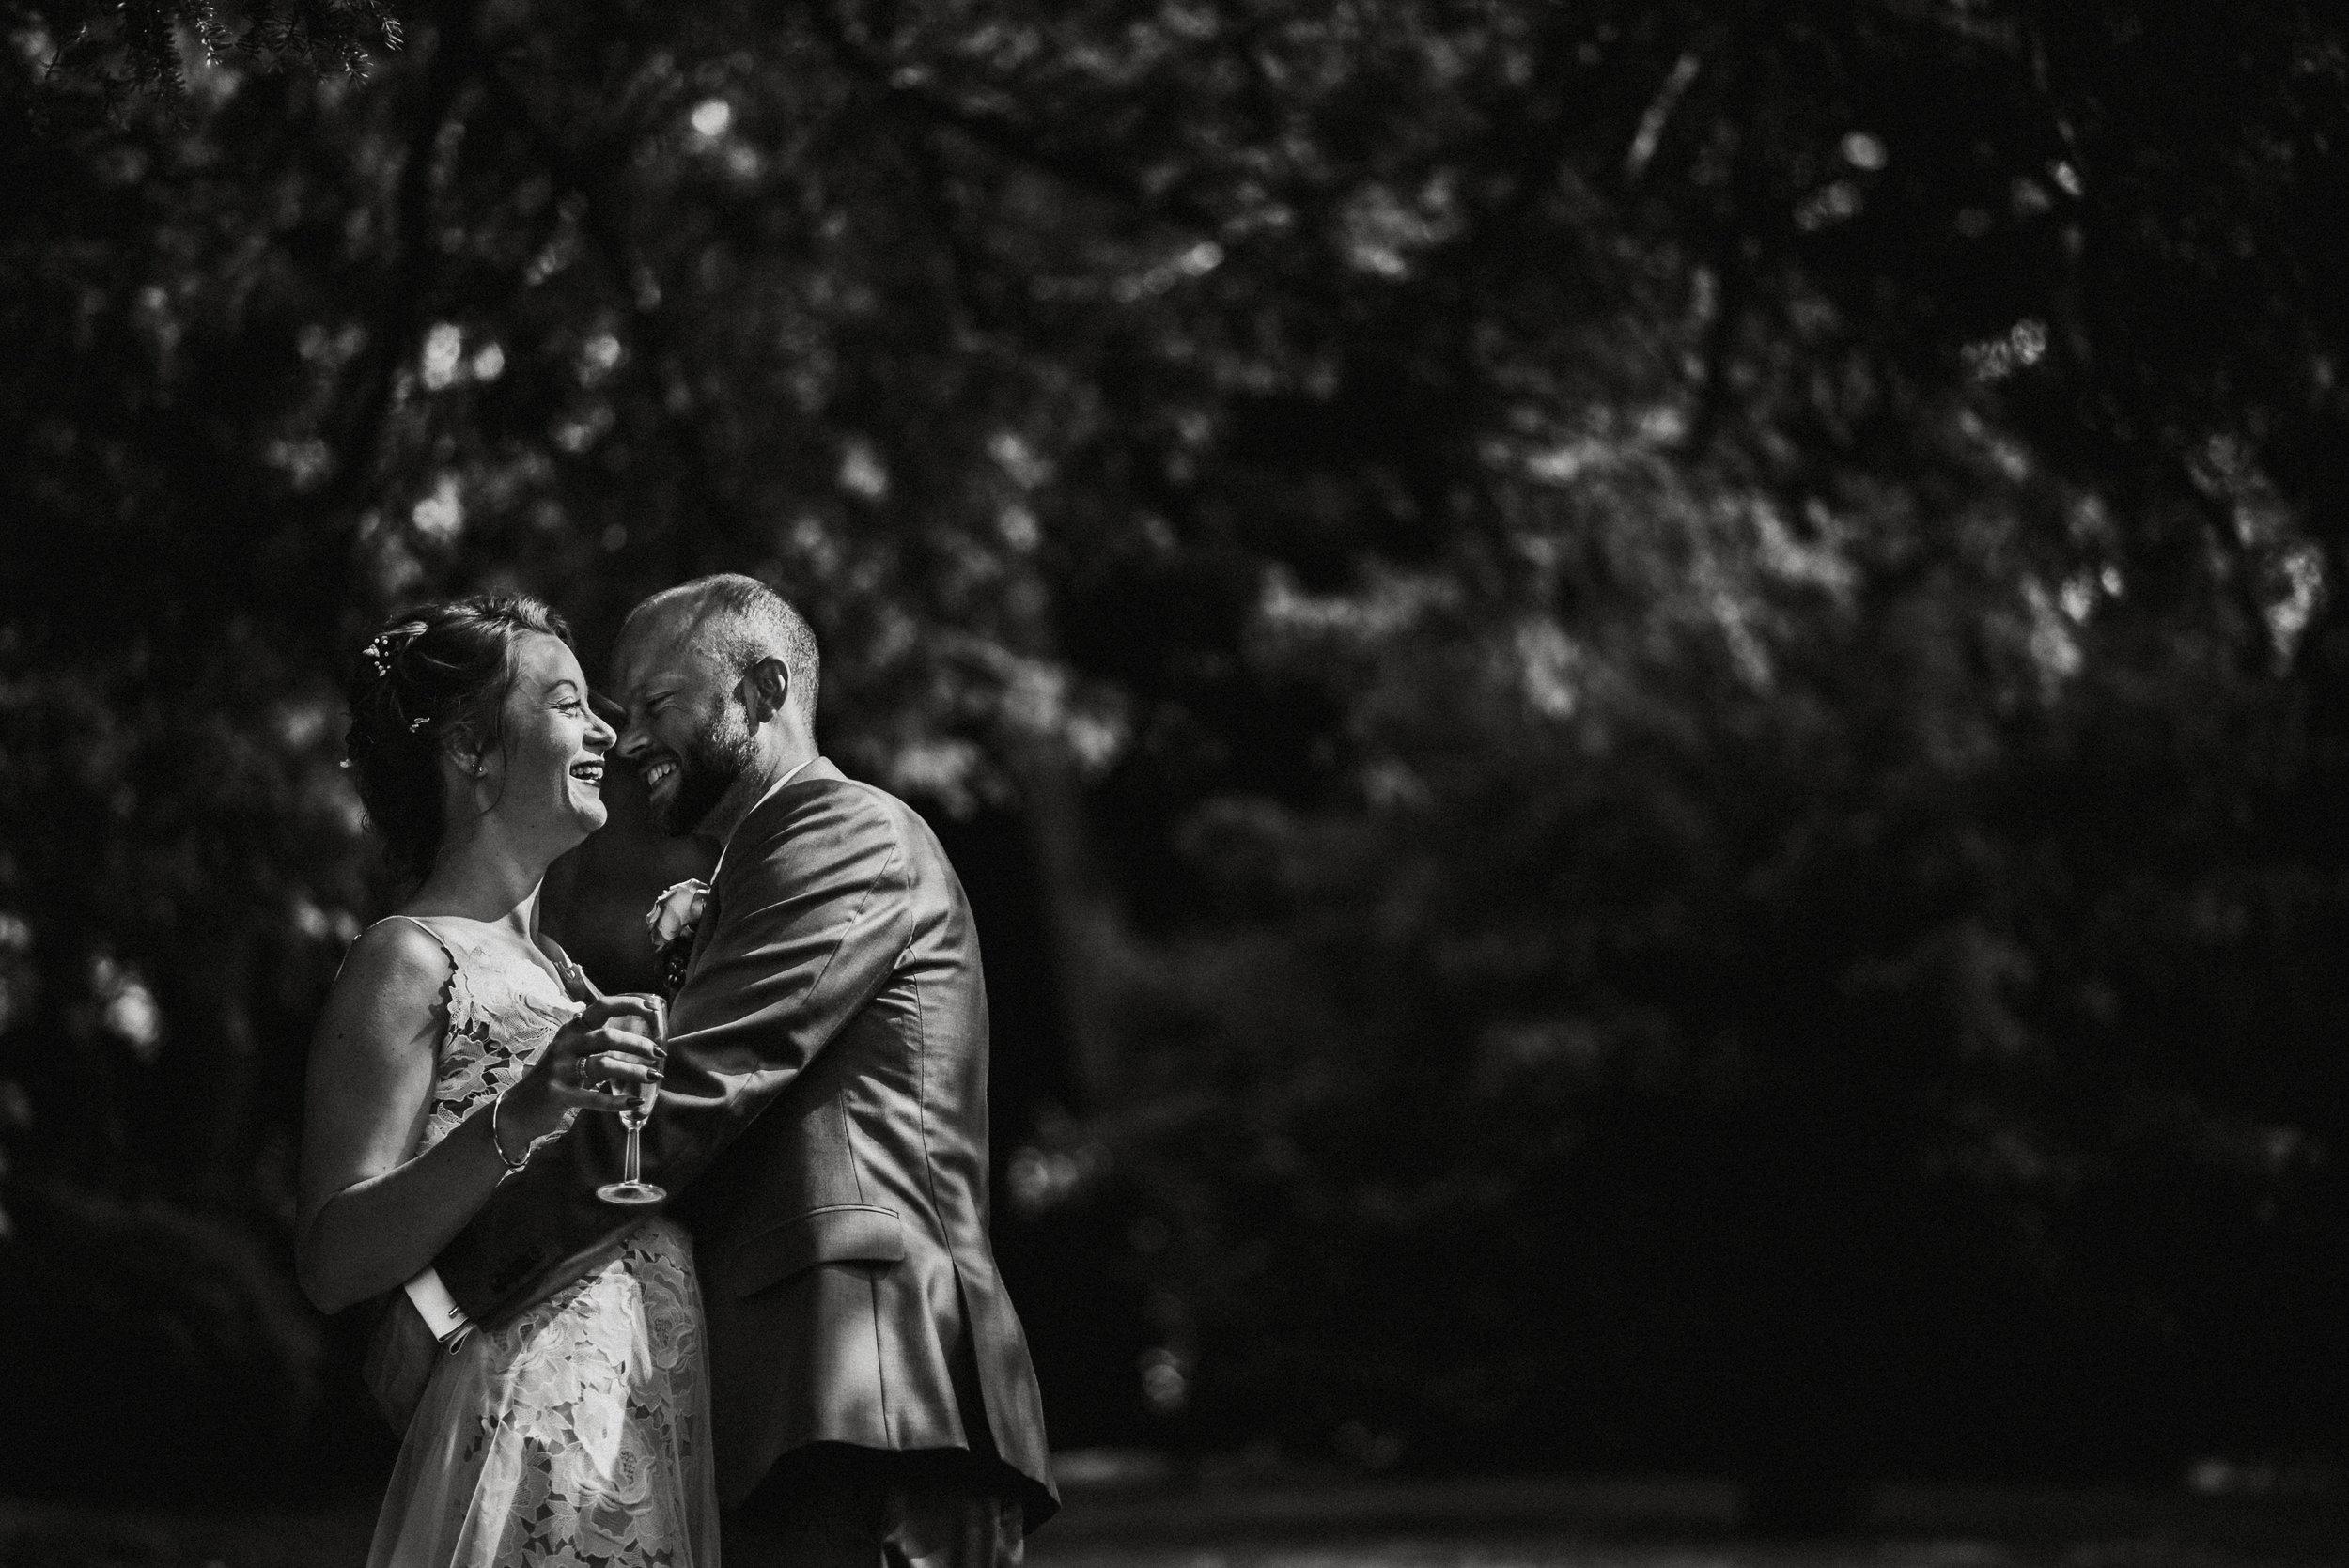 pencarrow-house-wedding-photographer-79.jpg